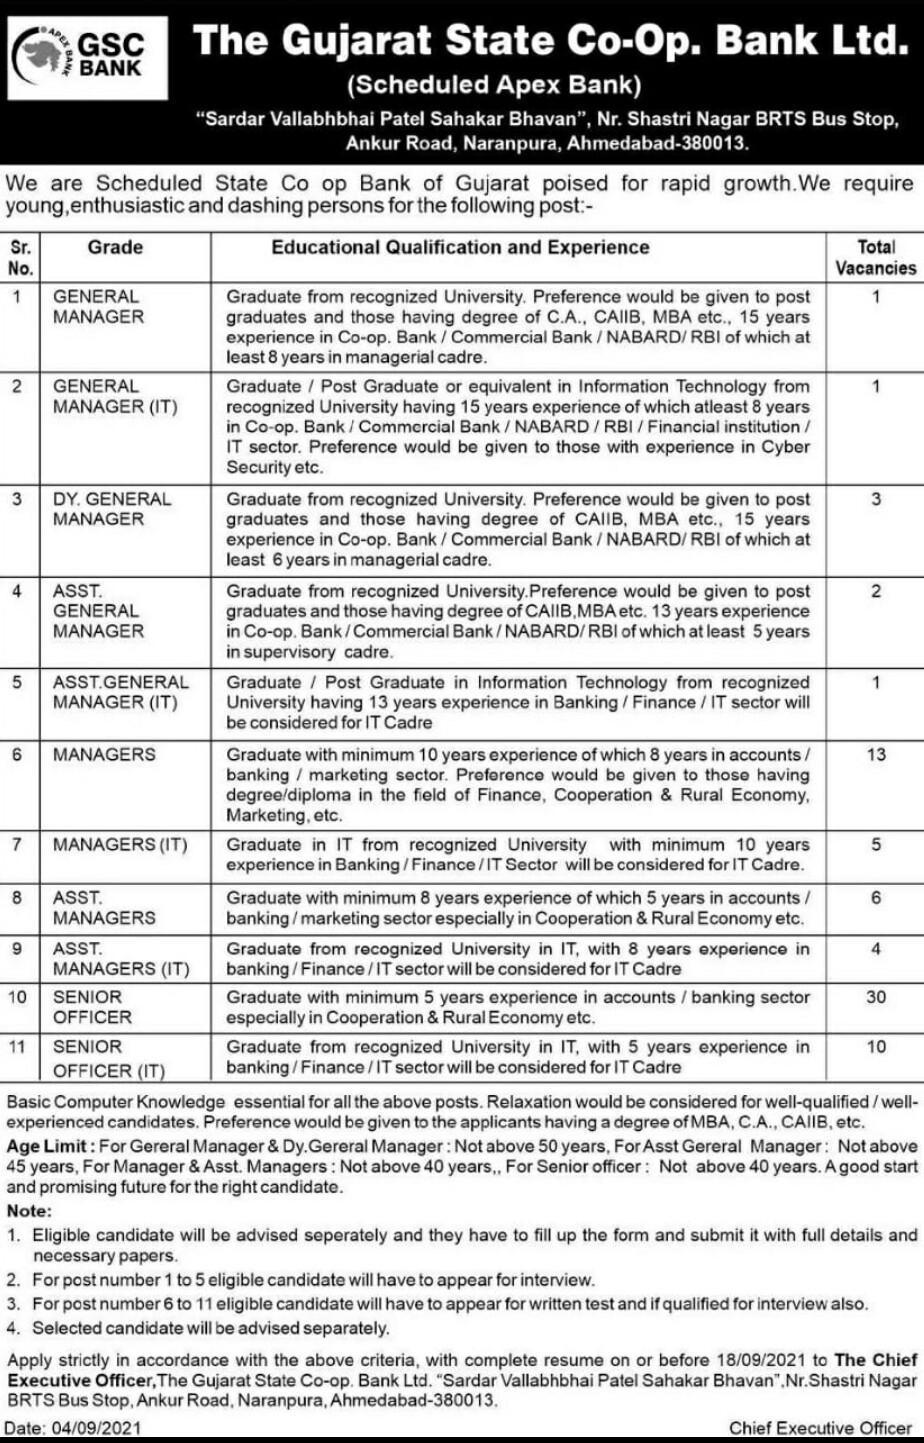 Gujarat State Co-Operative Bank Limited Recruitment 2021